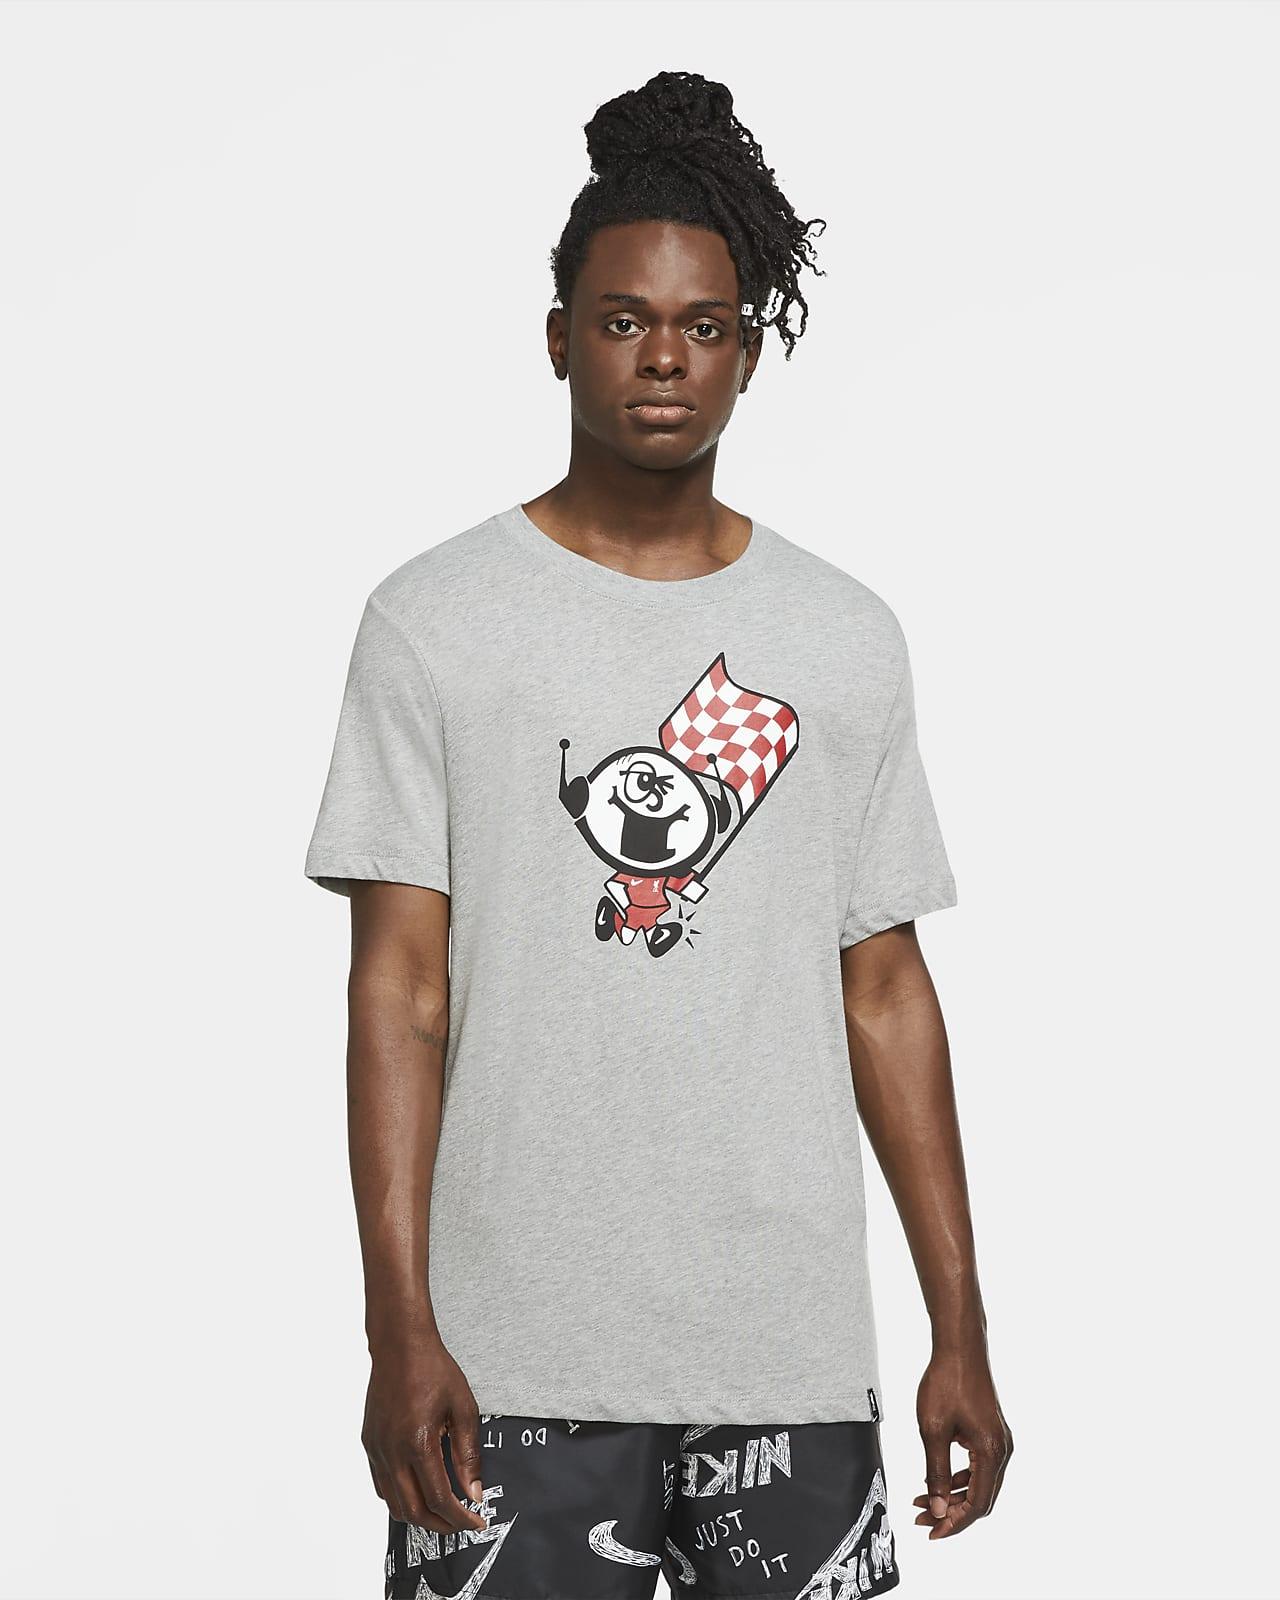 Liverpool FC Men's Football T-Shirt